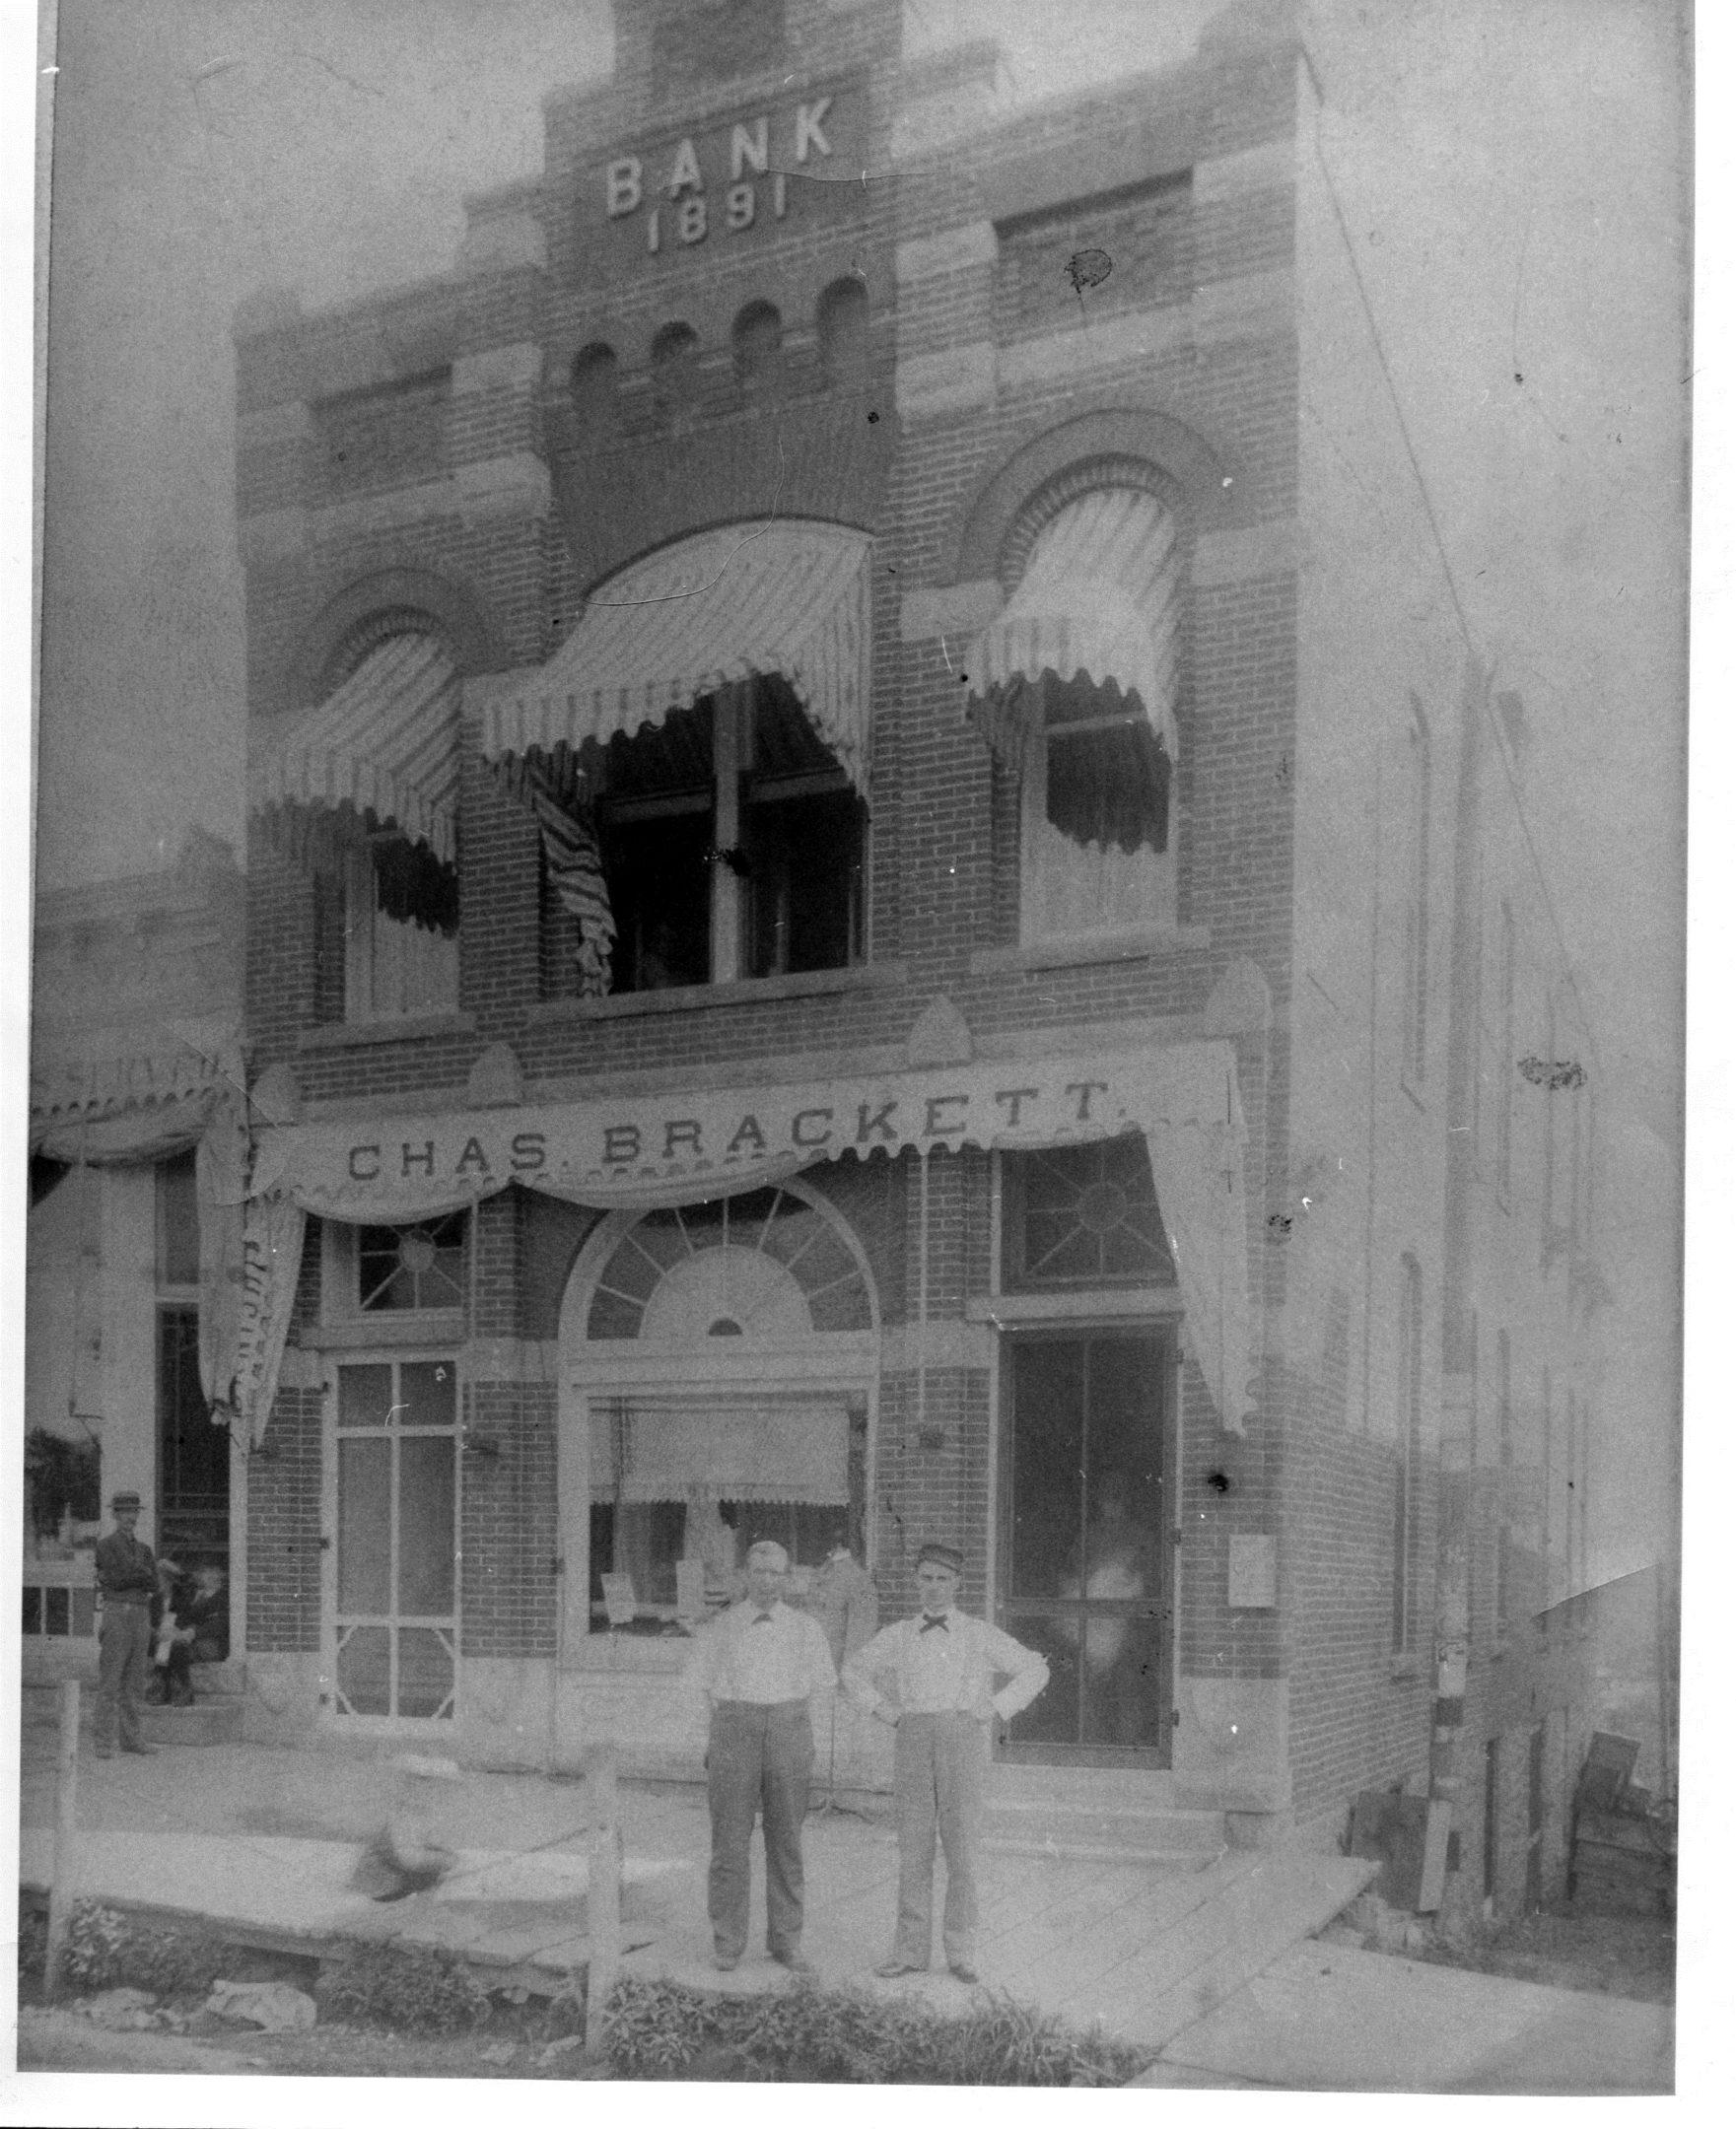 photo of Bank-Bracket Building